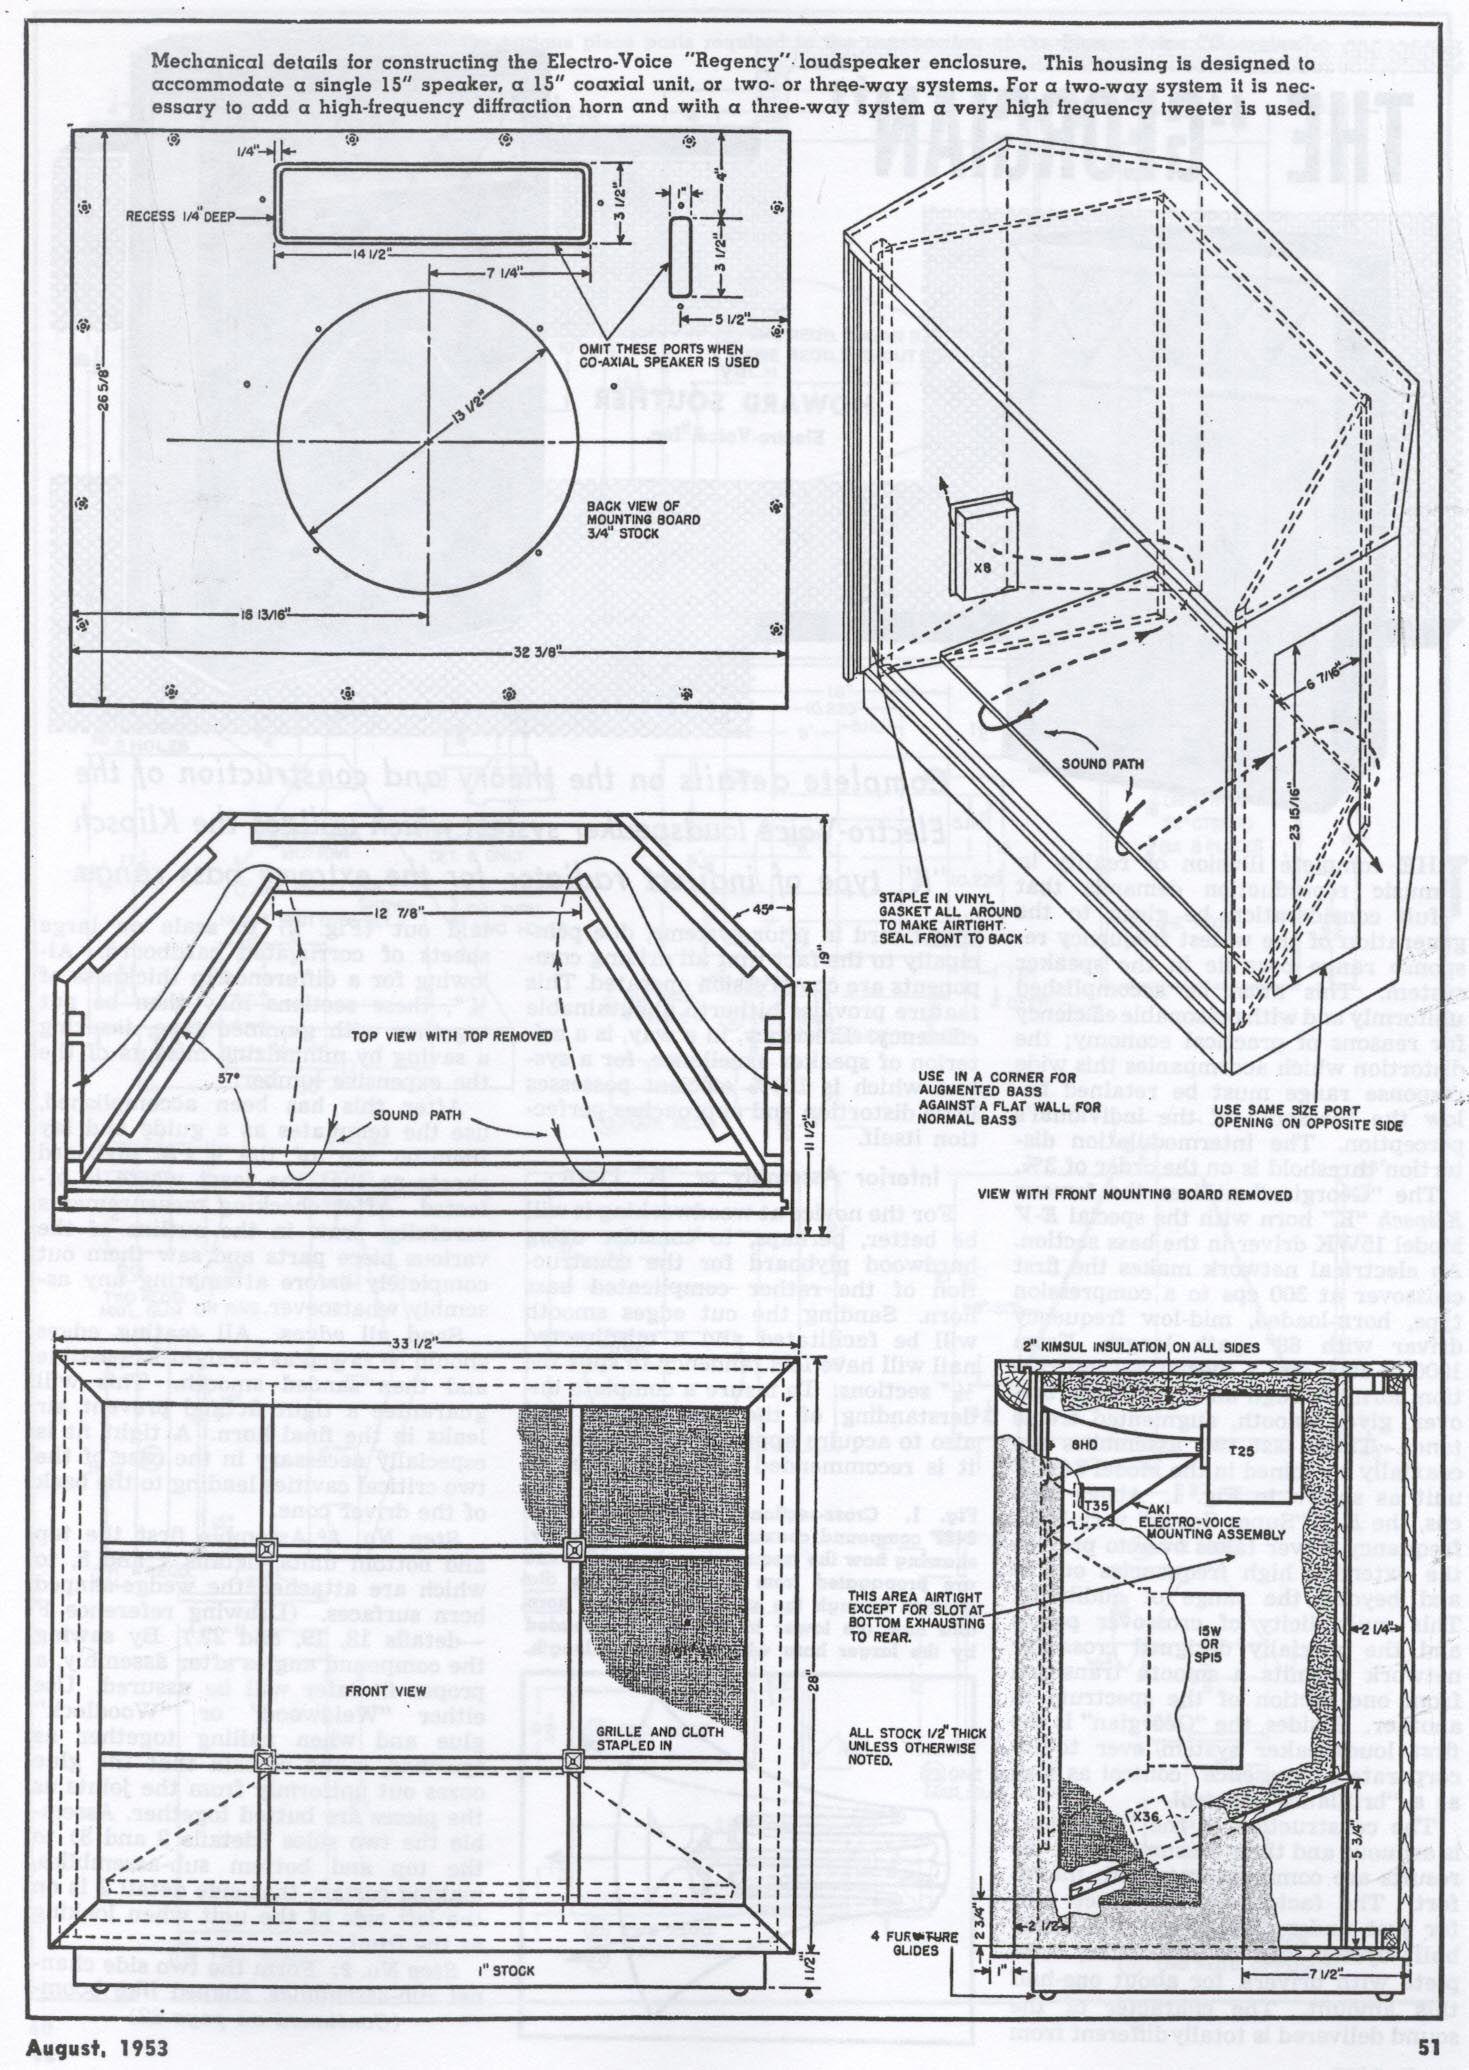 Skema box speaker woofer search results woodworking project ideas - Klipschorn Plans Google Search